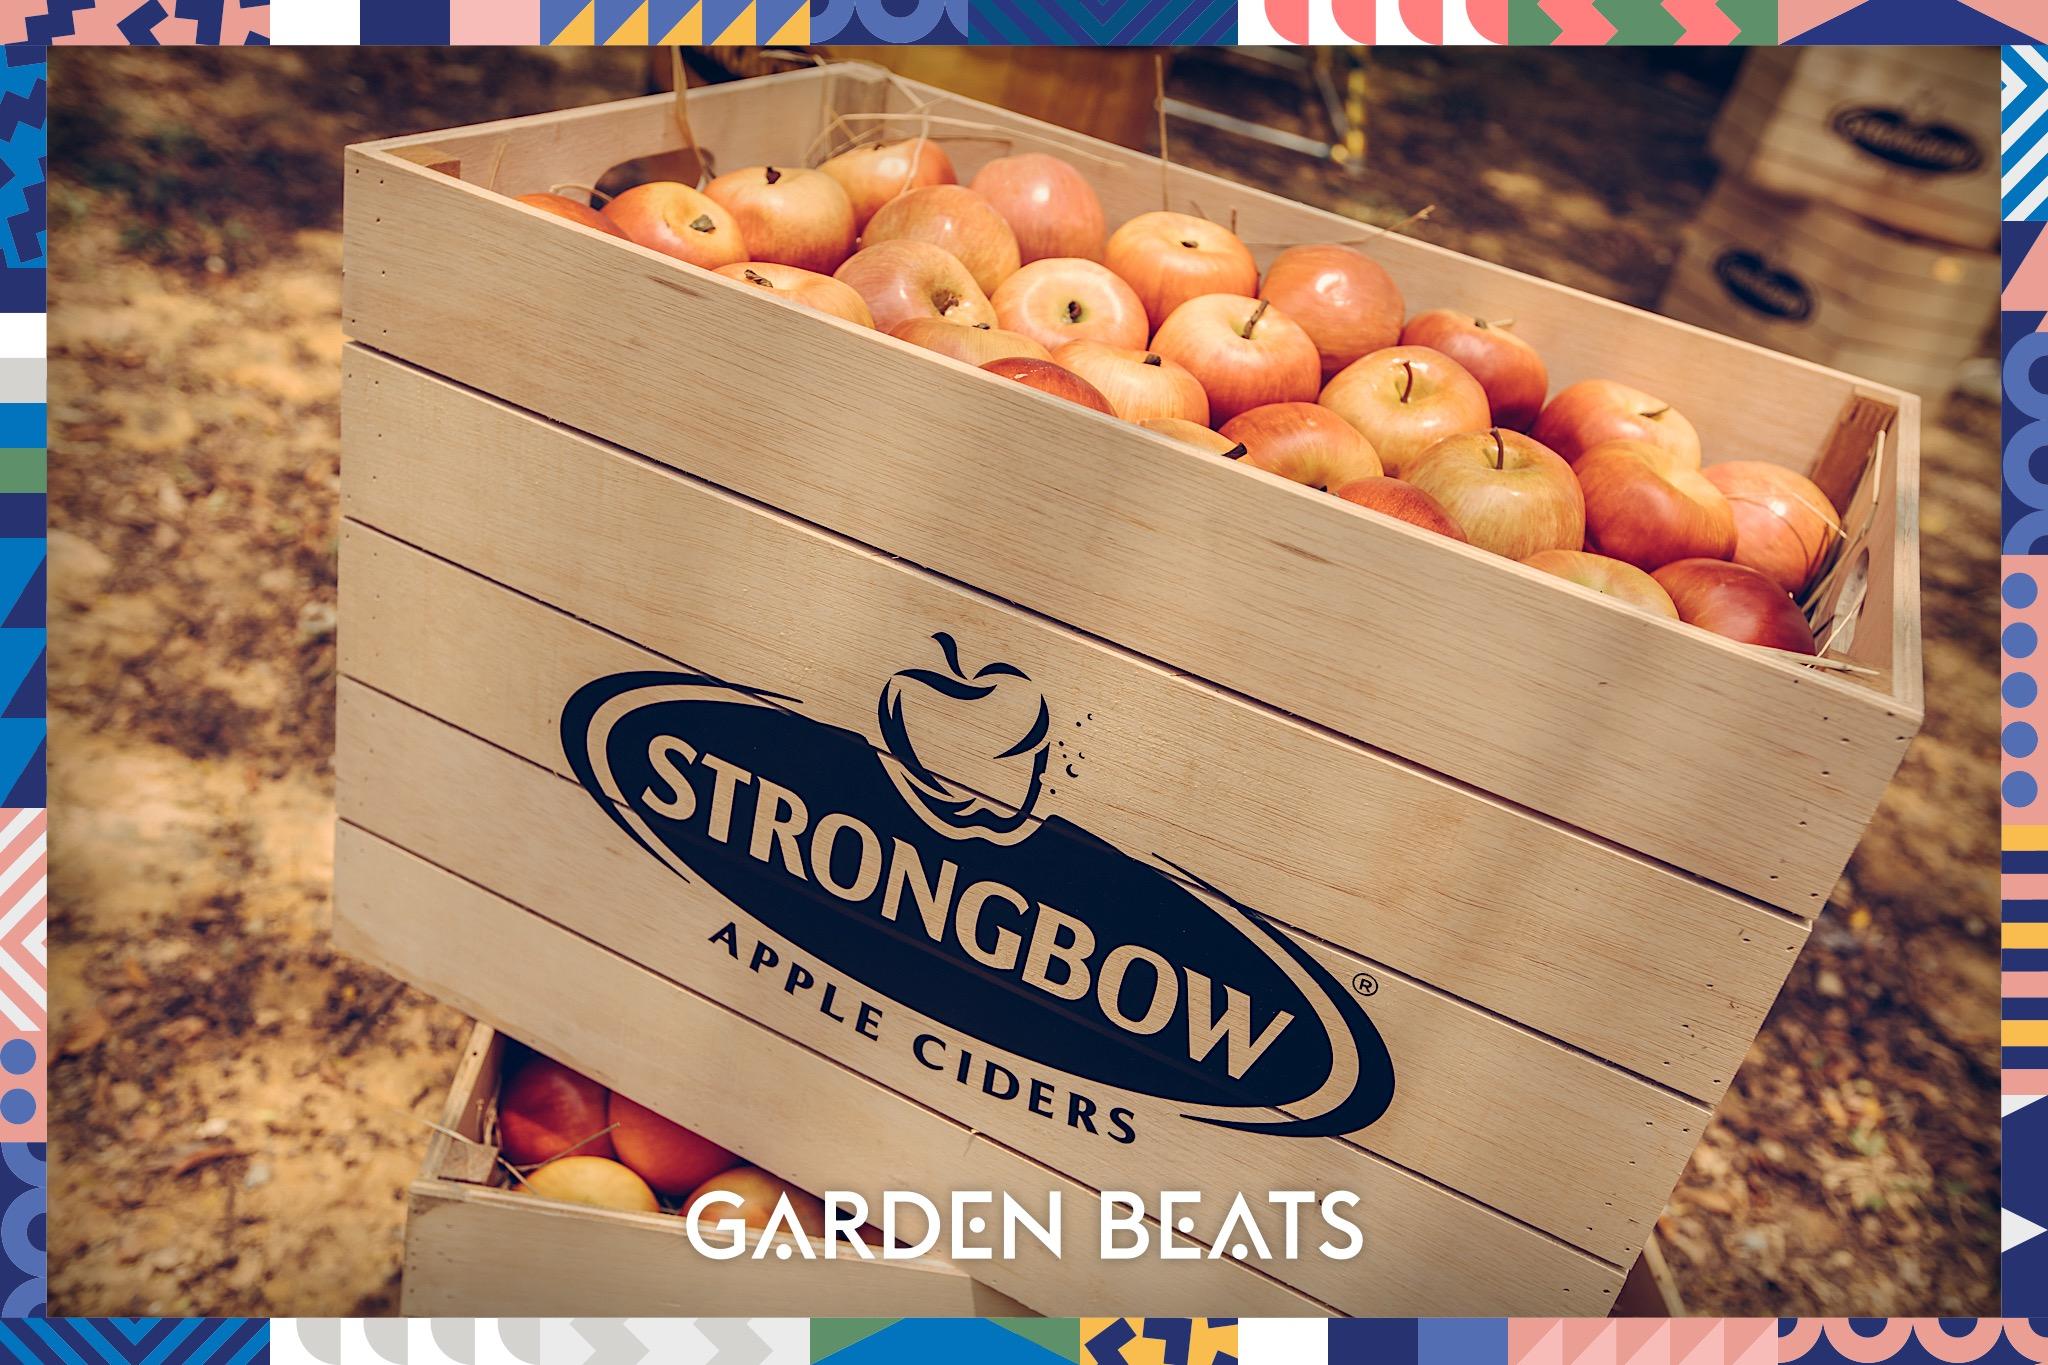 03032018_GardenBeats_Colossal038_Watermarked.jpg